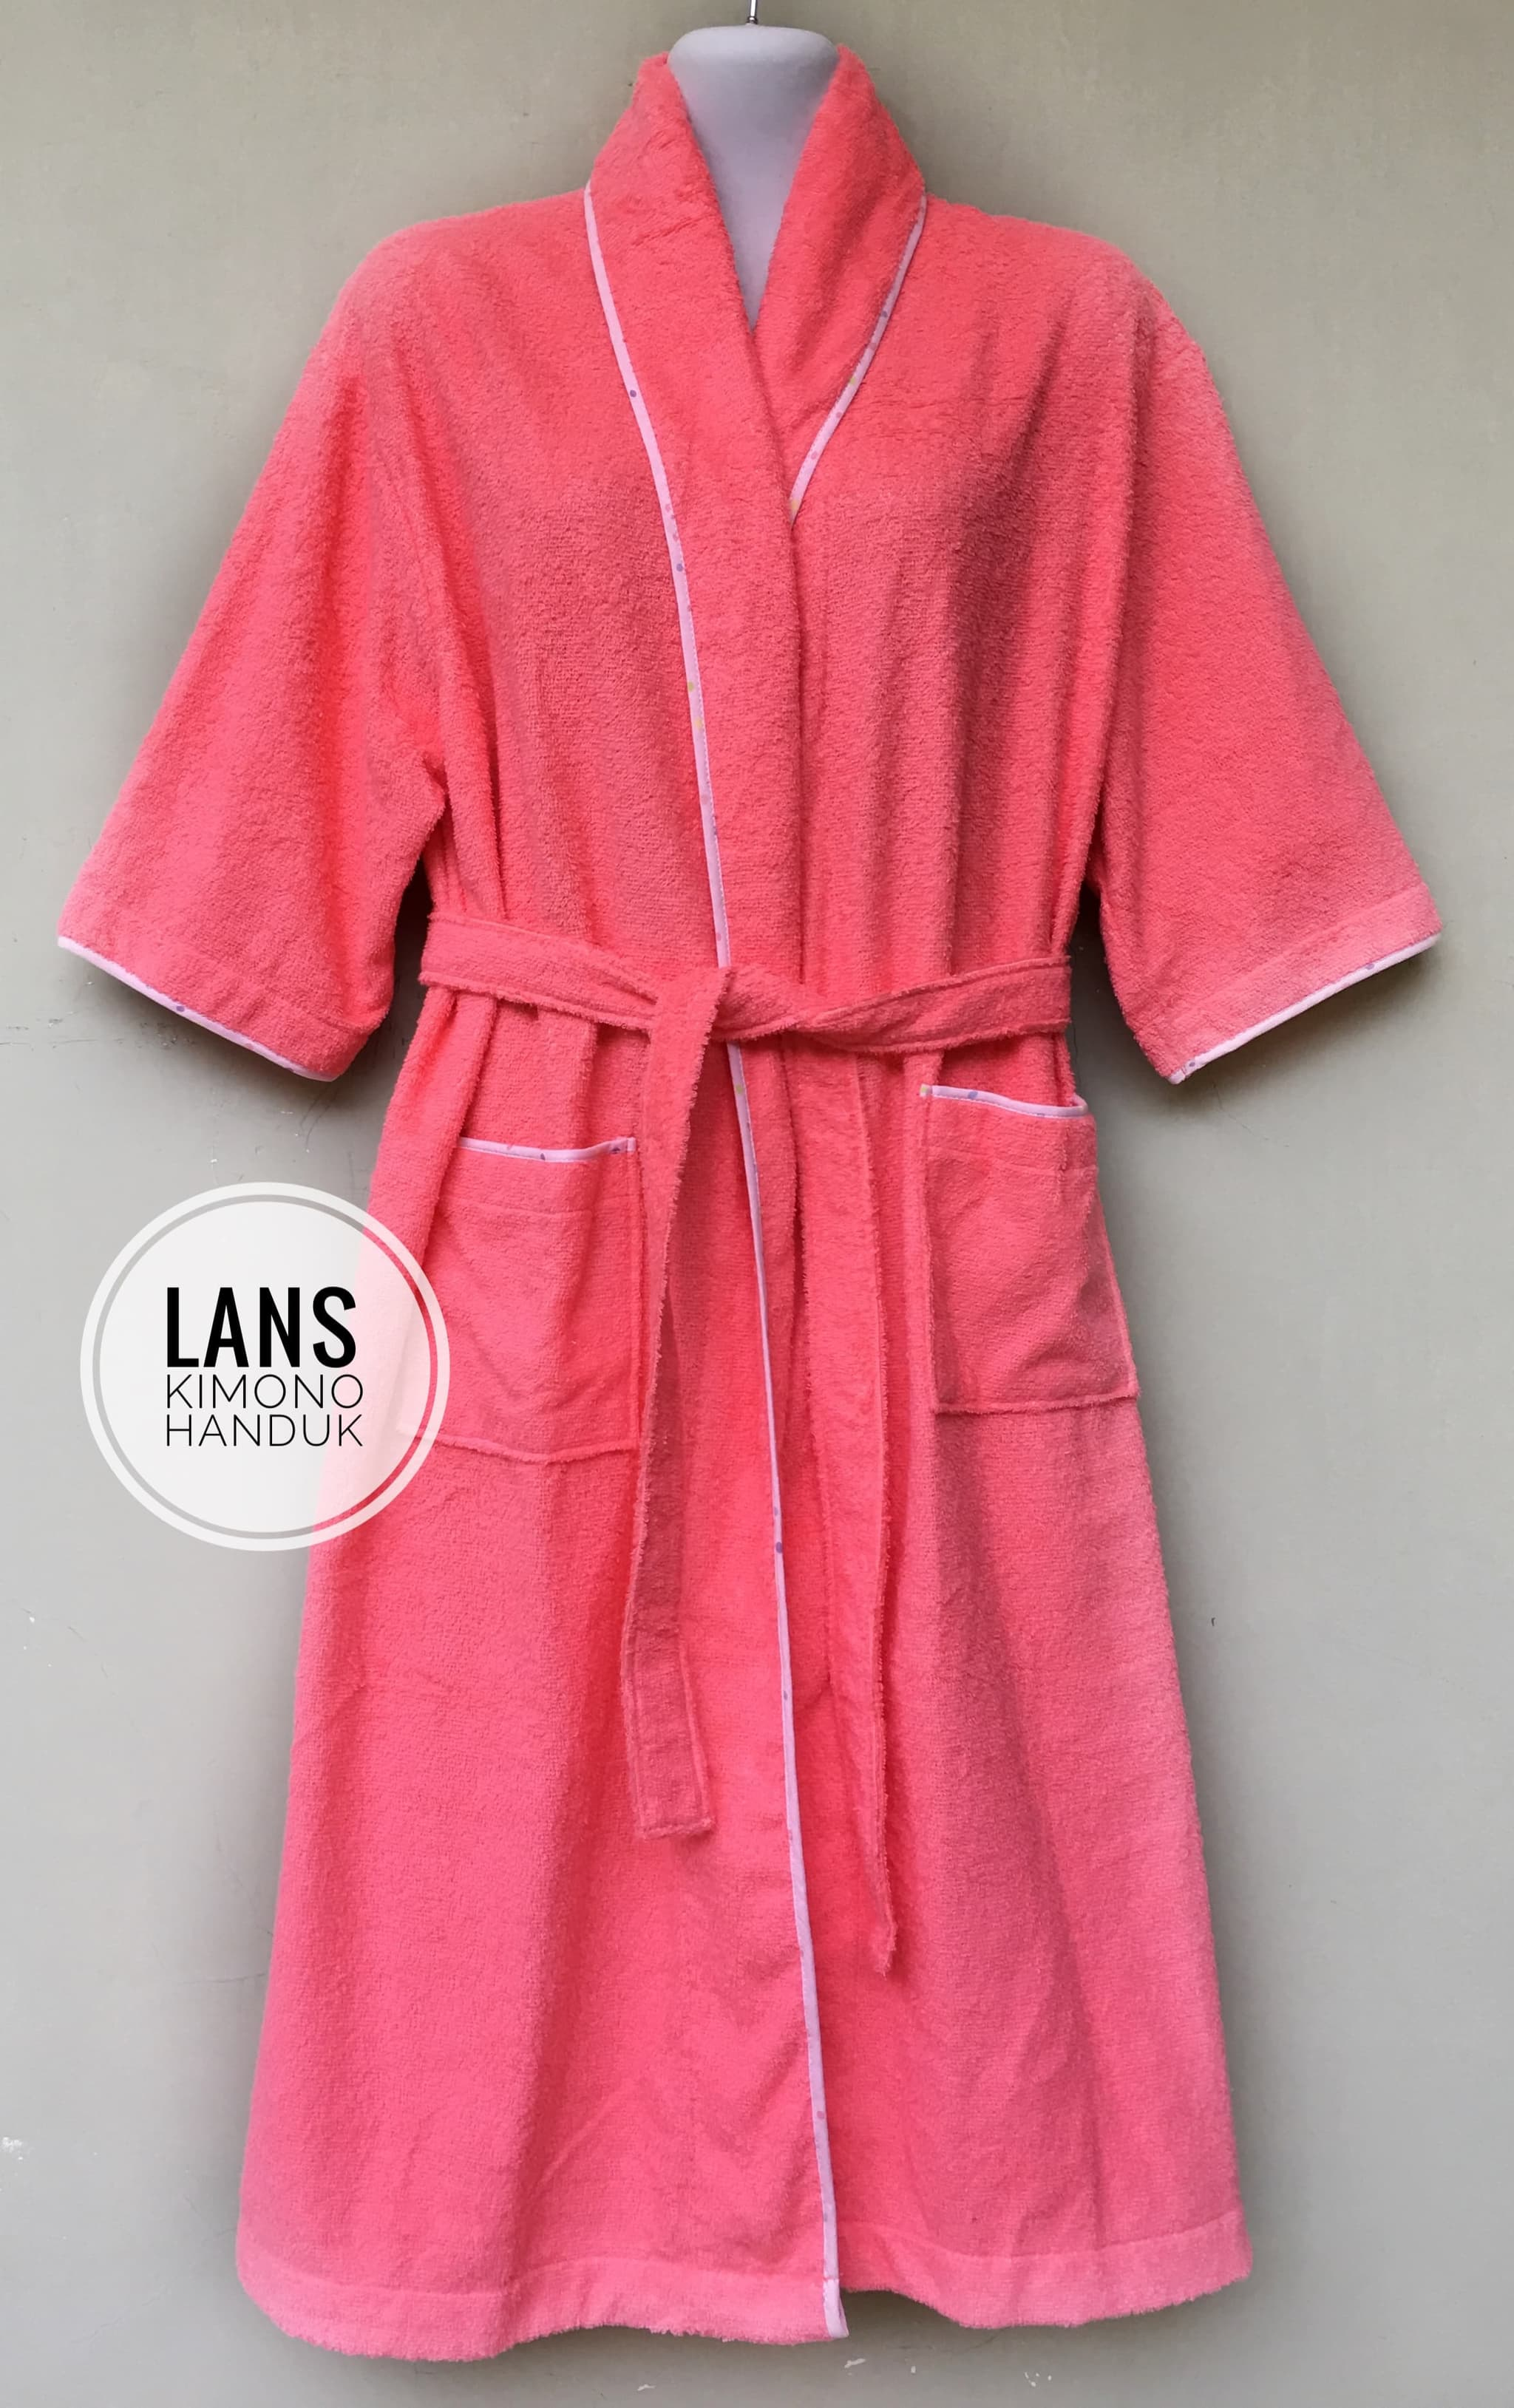 Jual Kimono Handuk Dewasa Lans Tokopedia Mandi Renang Fit To L Xl